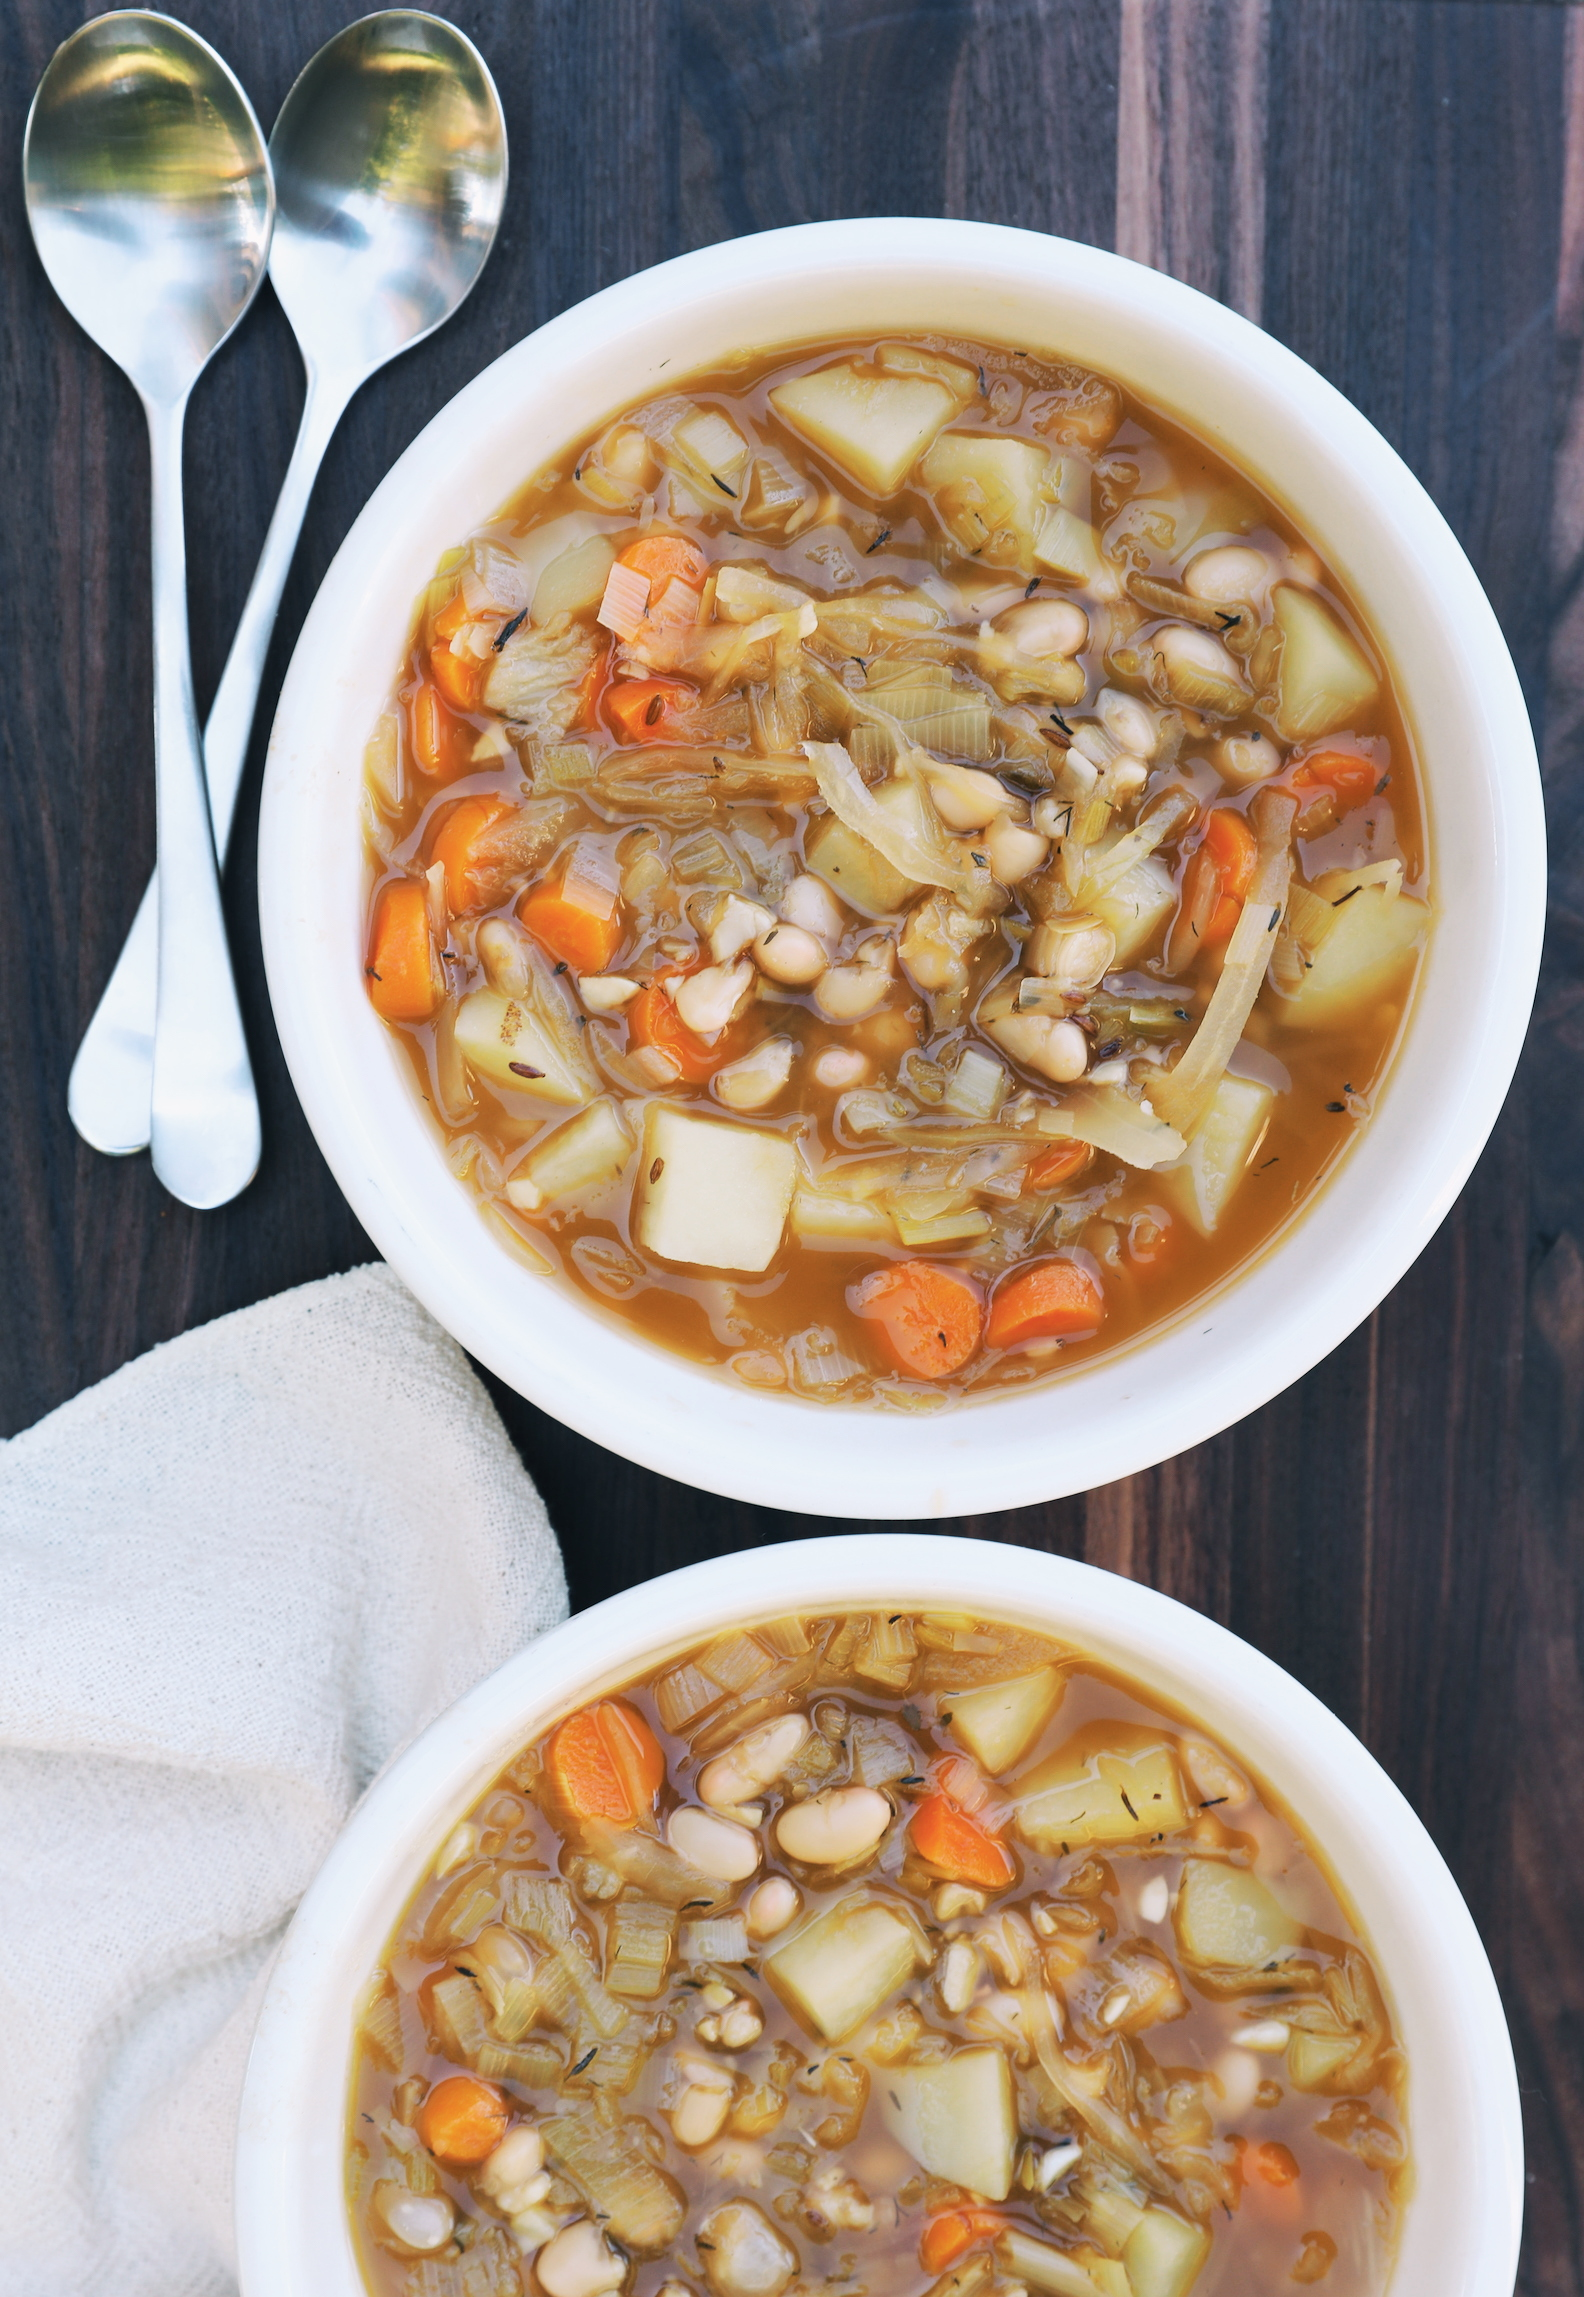 Sauerkraut Potato & White Bean Soup